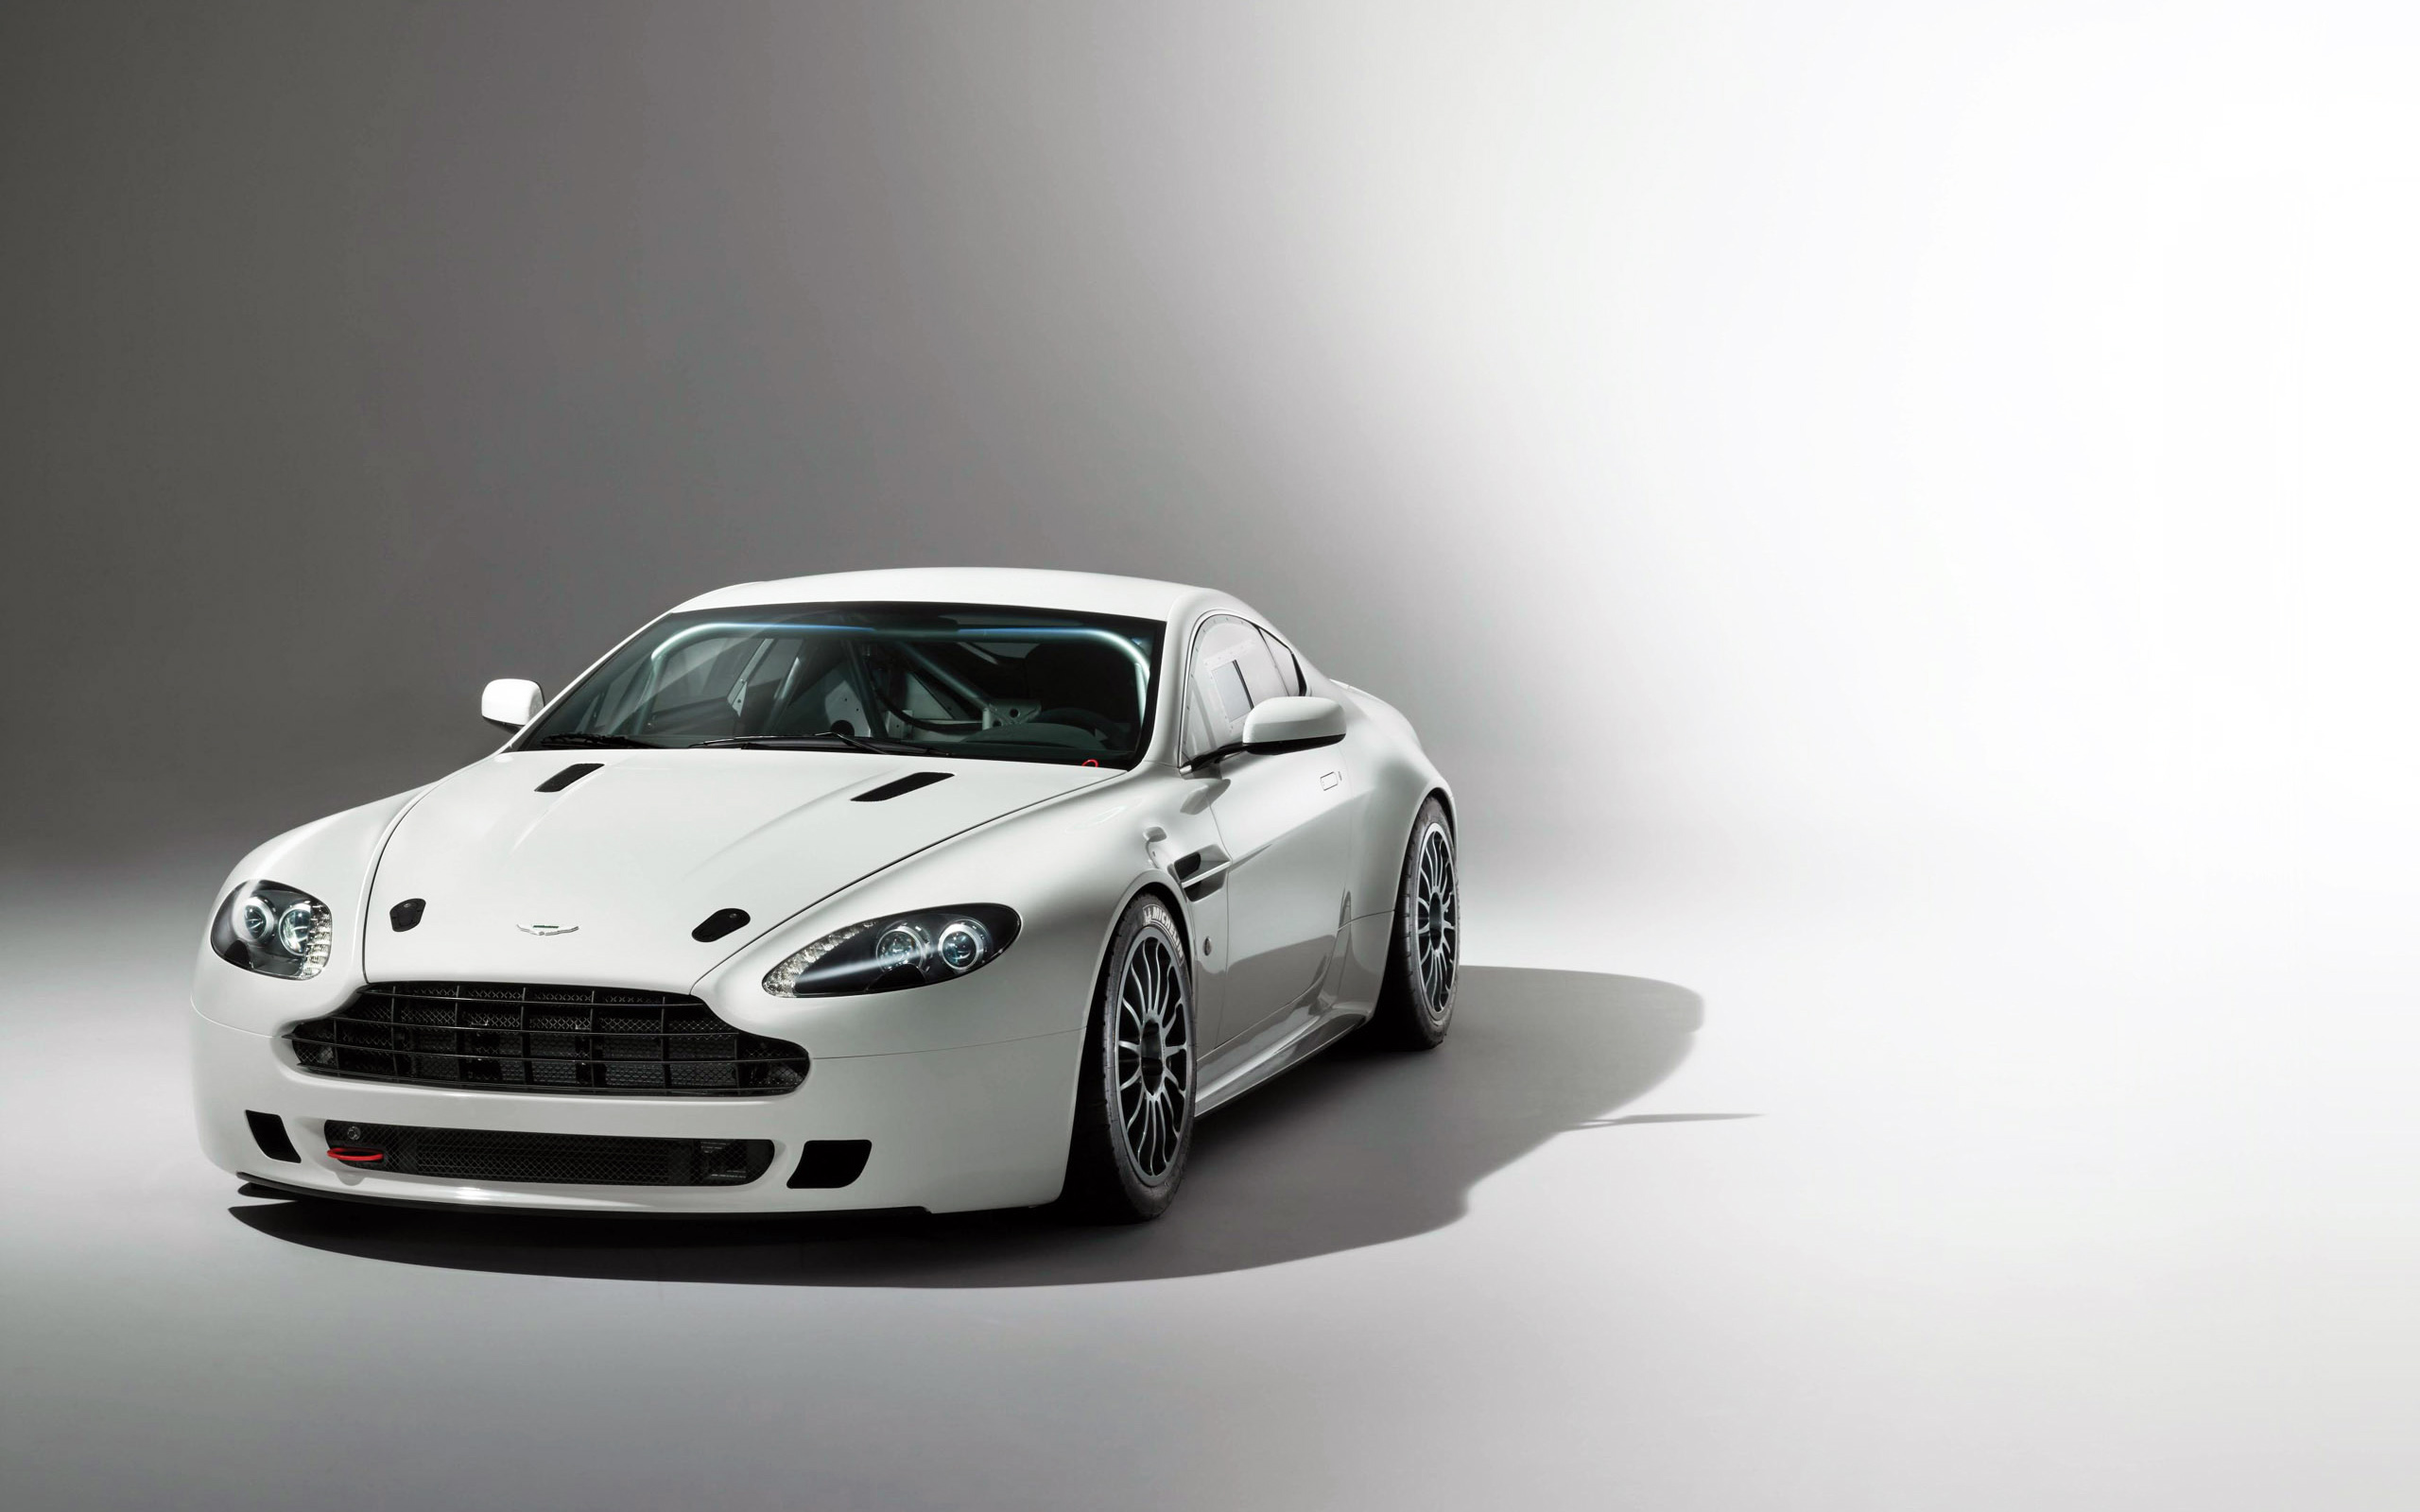 Aston Martin Vantage Hd Wallpaper Background Image 2560x1600 Id 618298 Wallpaper Abyss